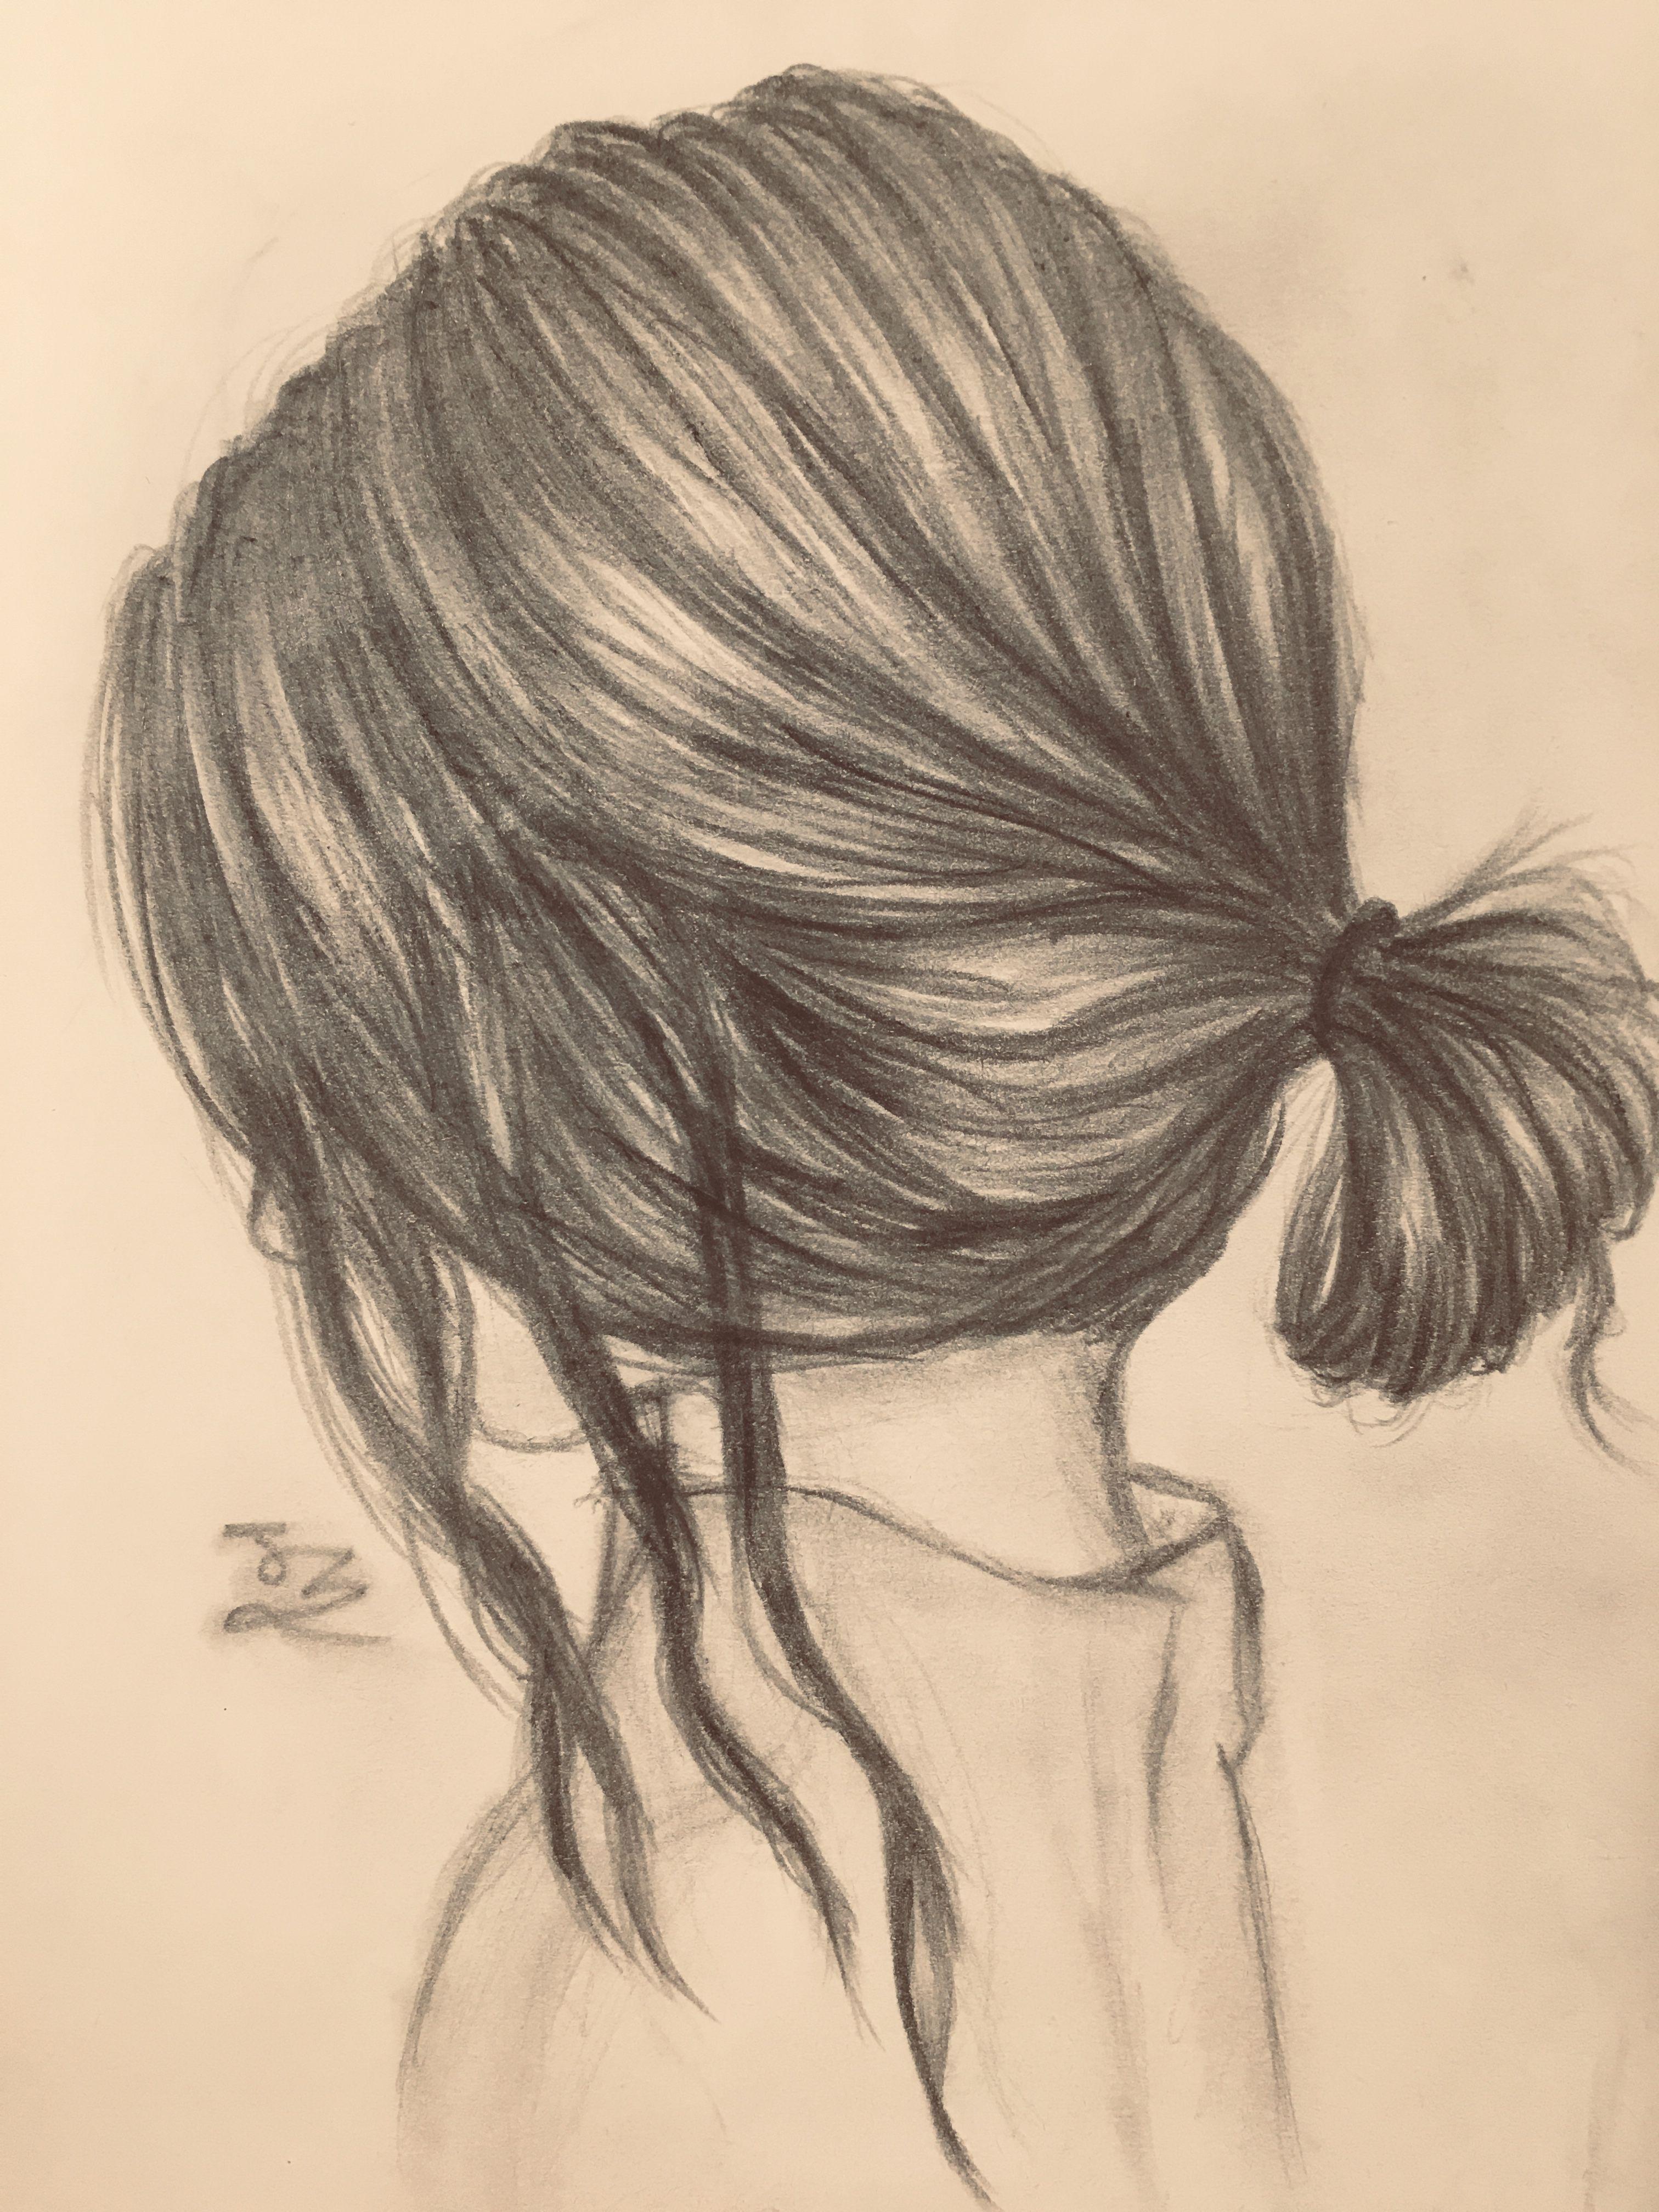 Jz Drawing Low Bun Cute Drawings Drawings Drawing Inspiration